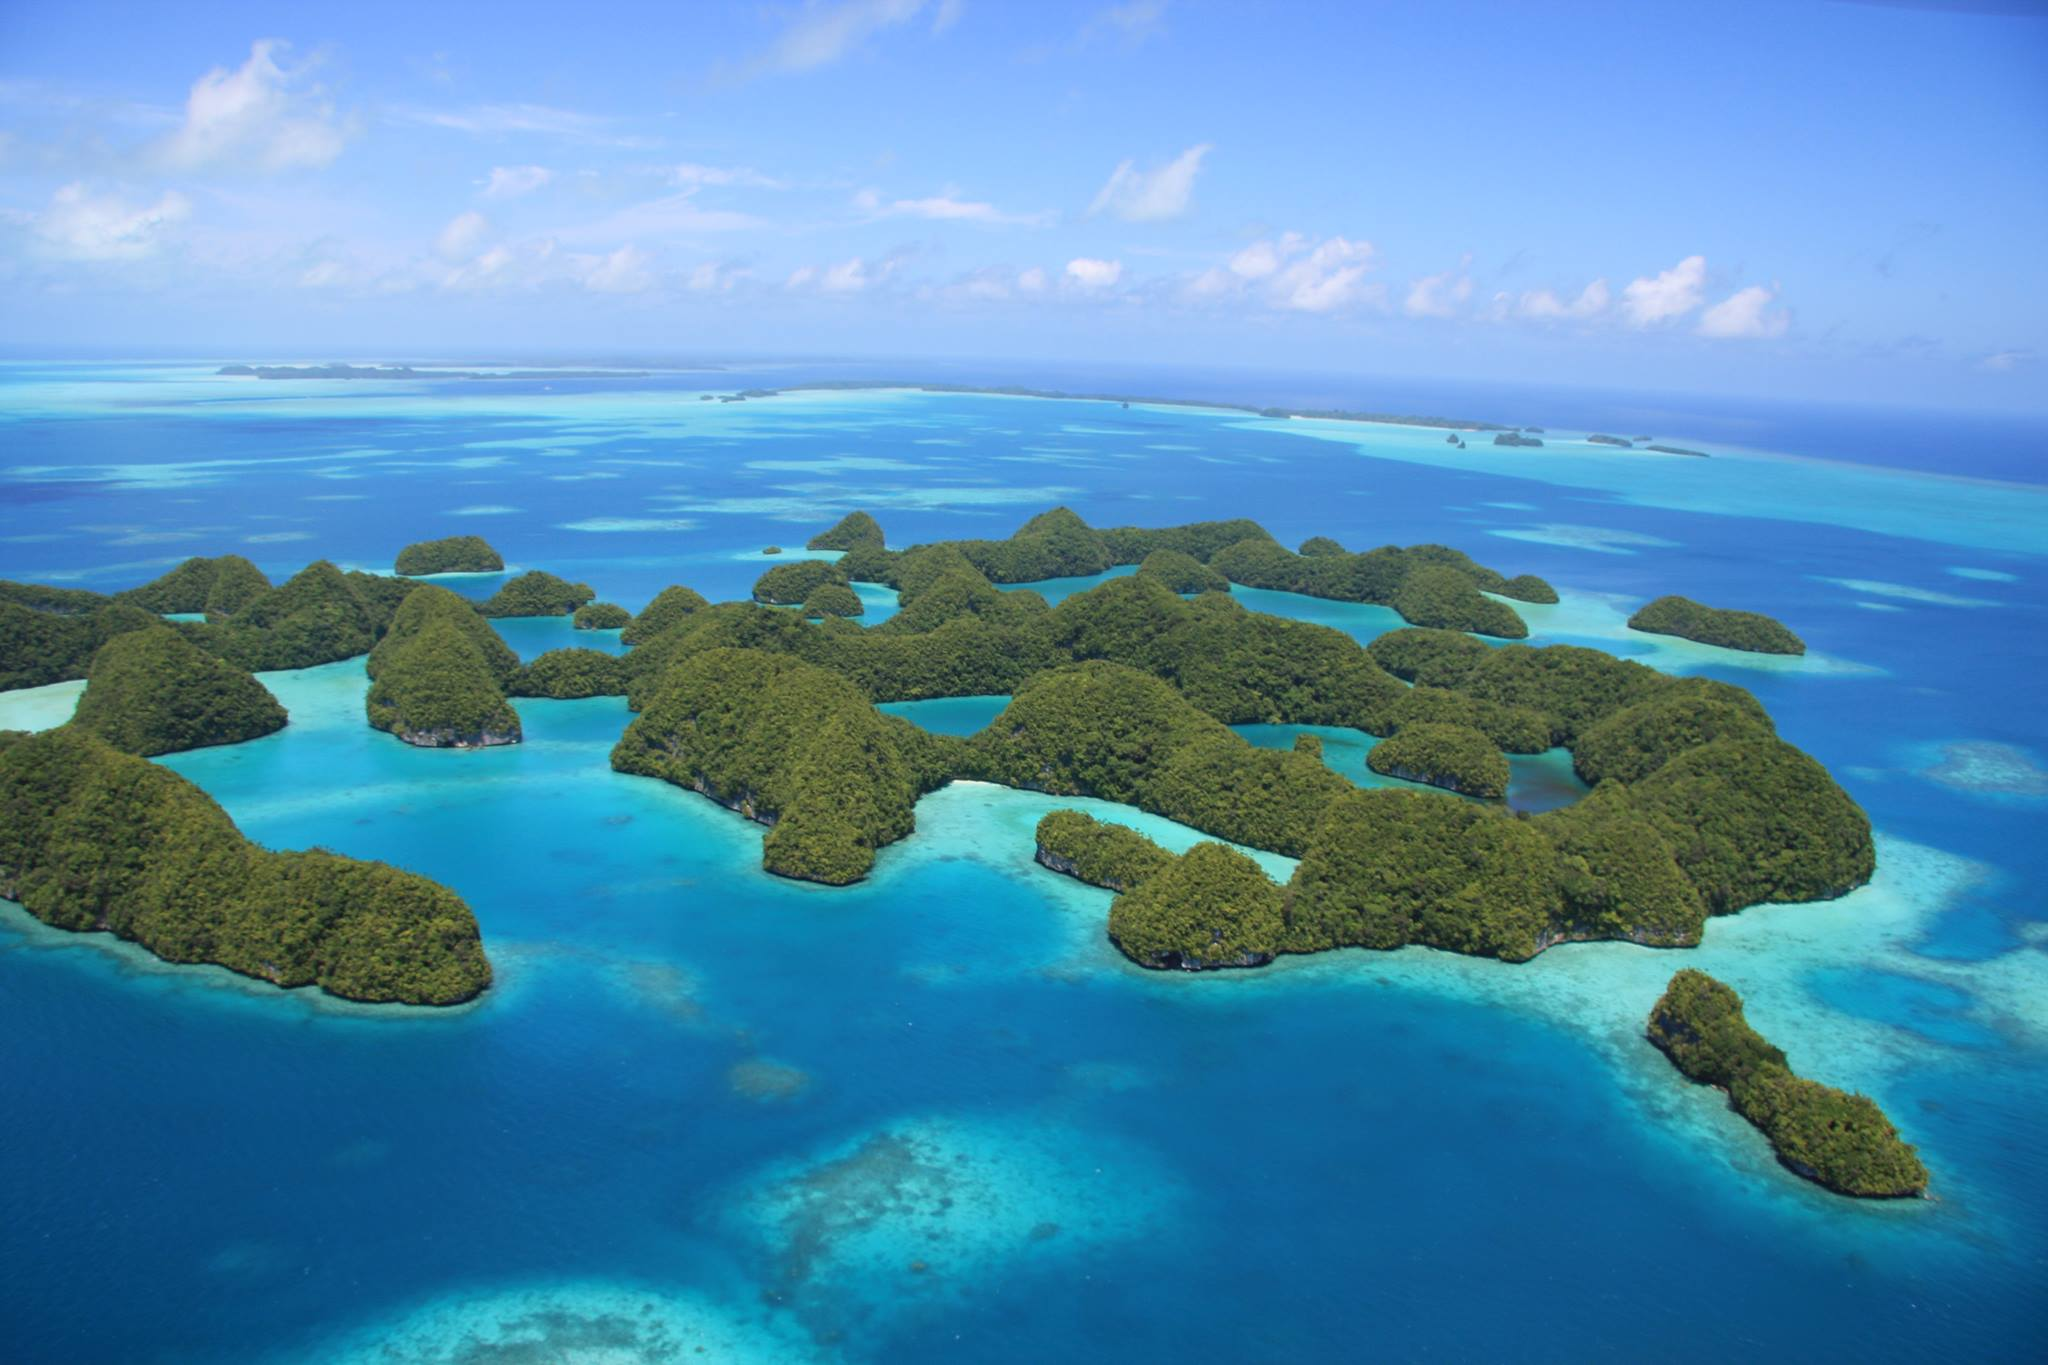 70 Islands Palau